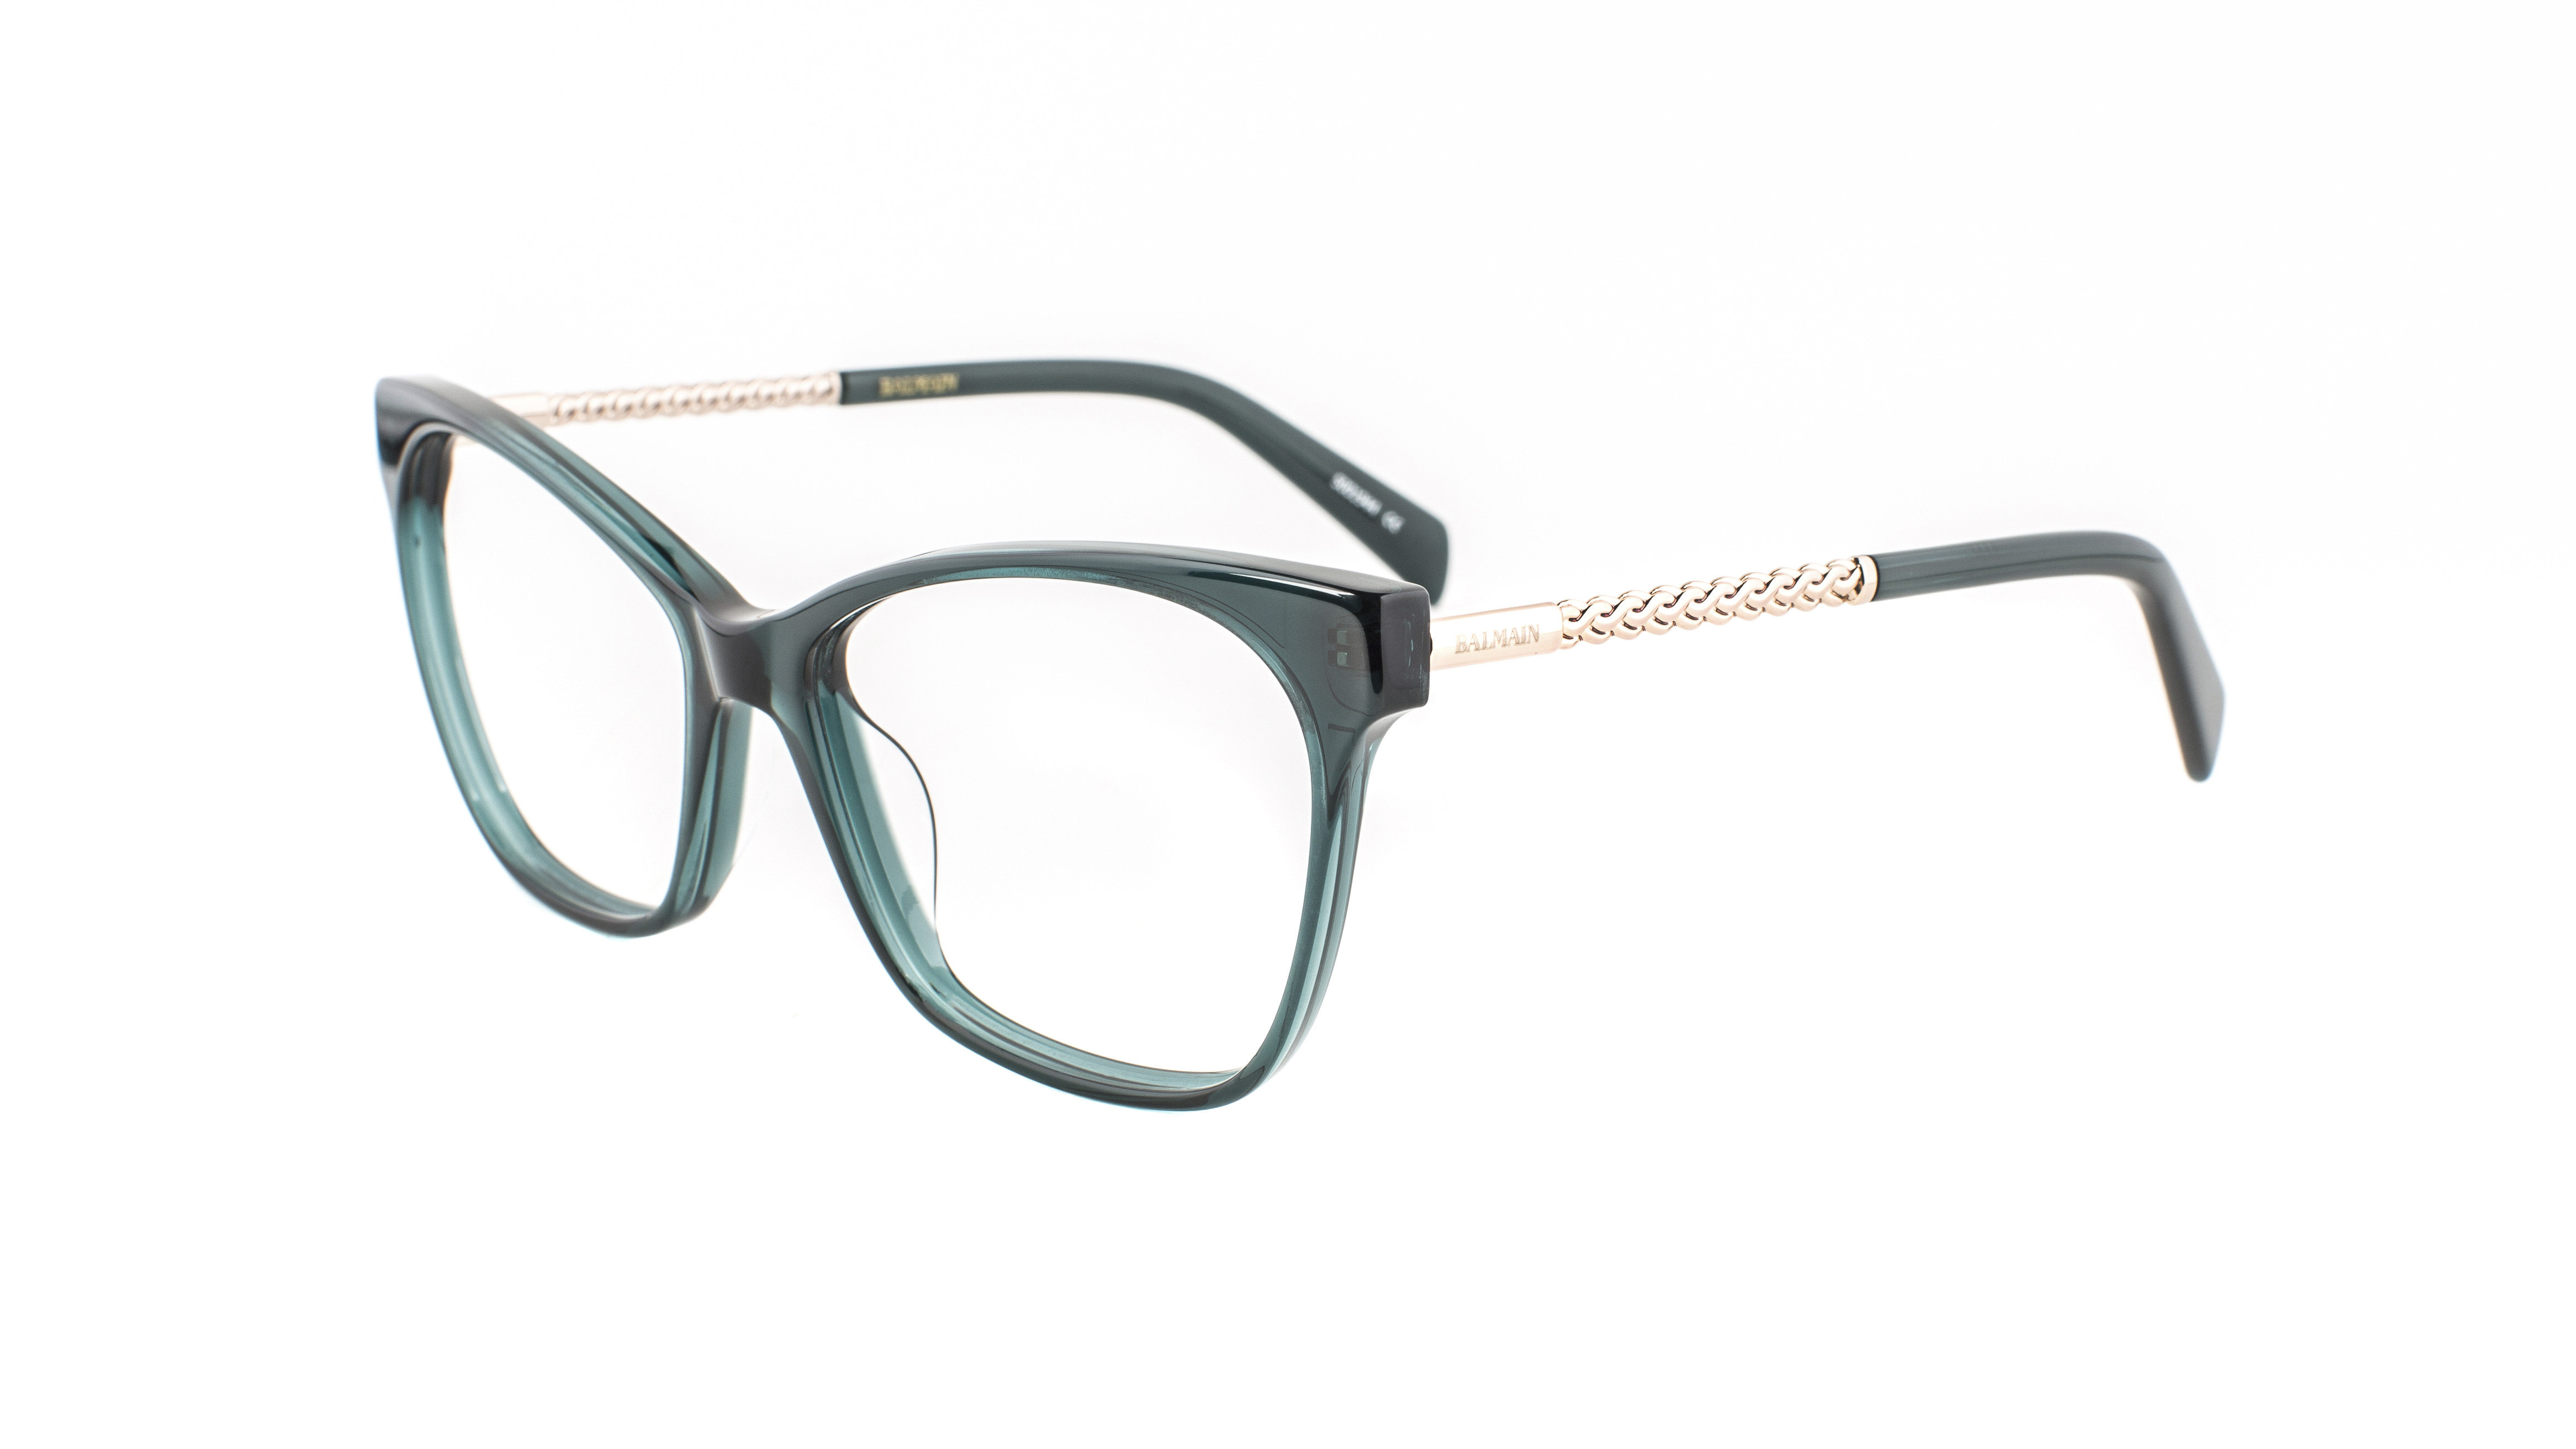 Balmain x Specsavers BL150S 30570795 - RRP 2 pairs single vision $459